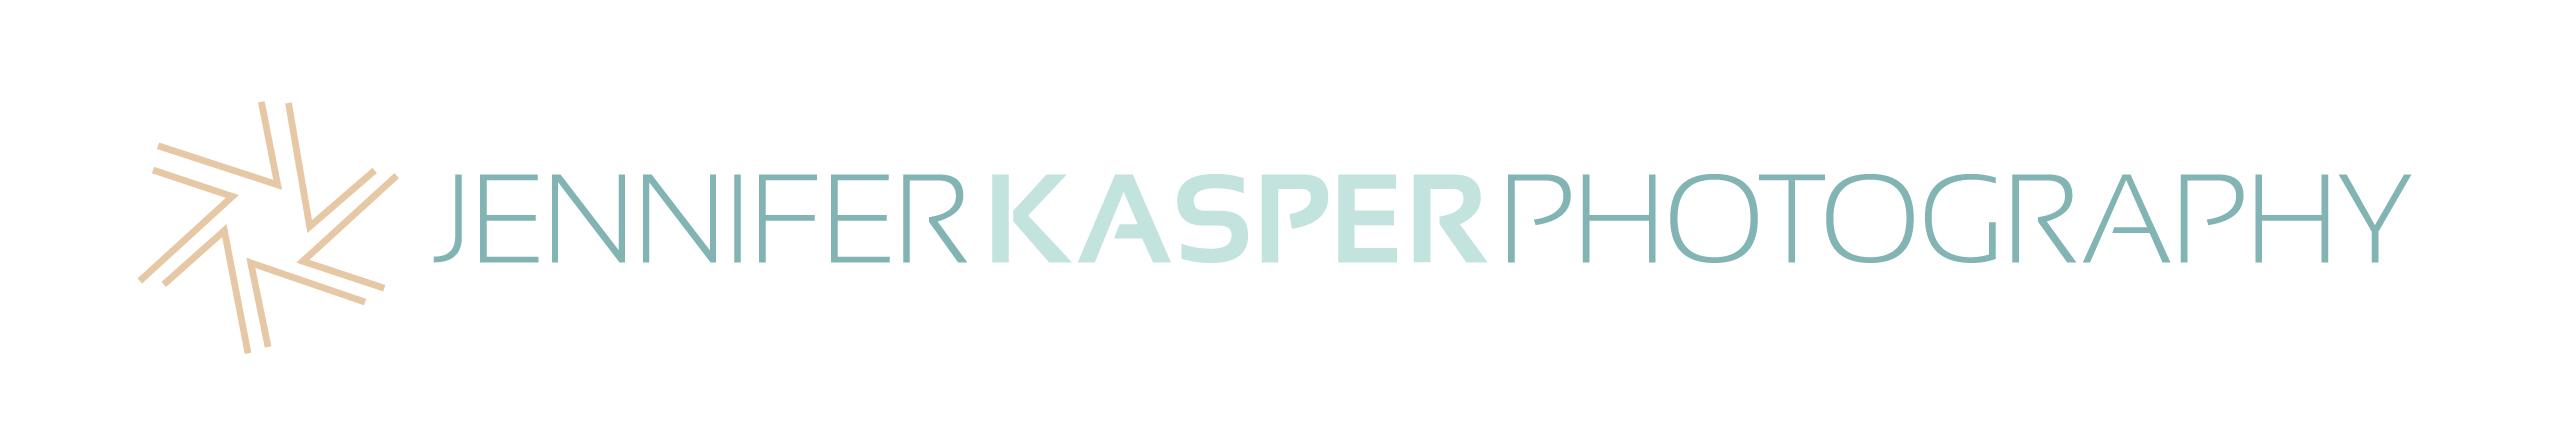 Photographer Visual Identity Logo and Branding Design